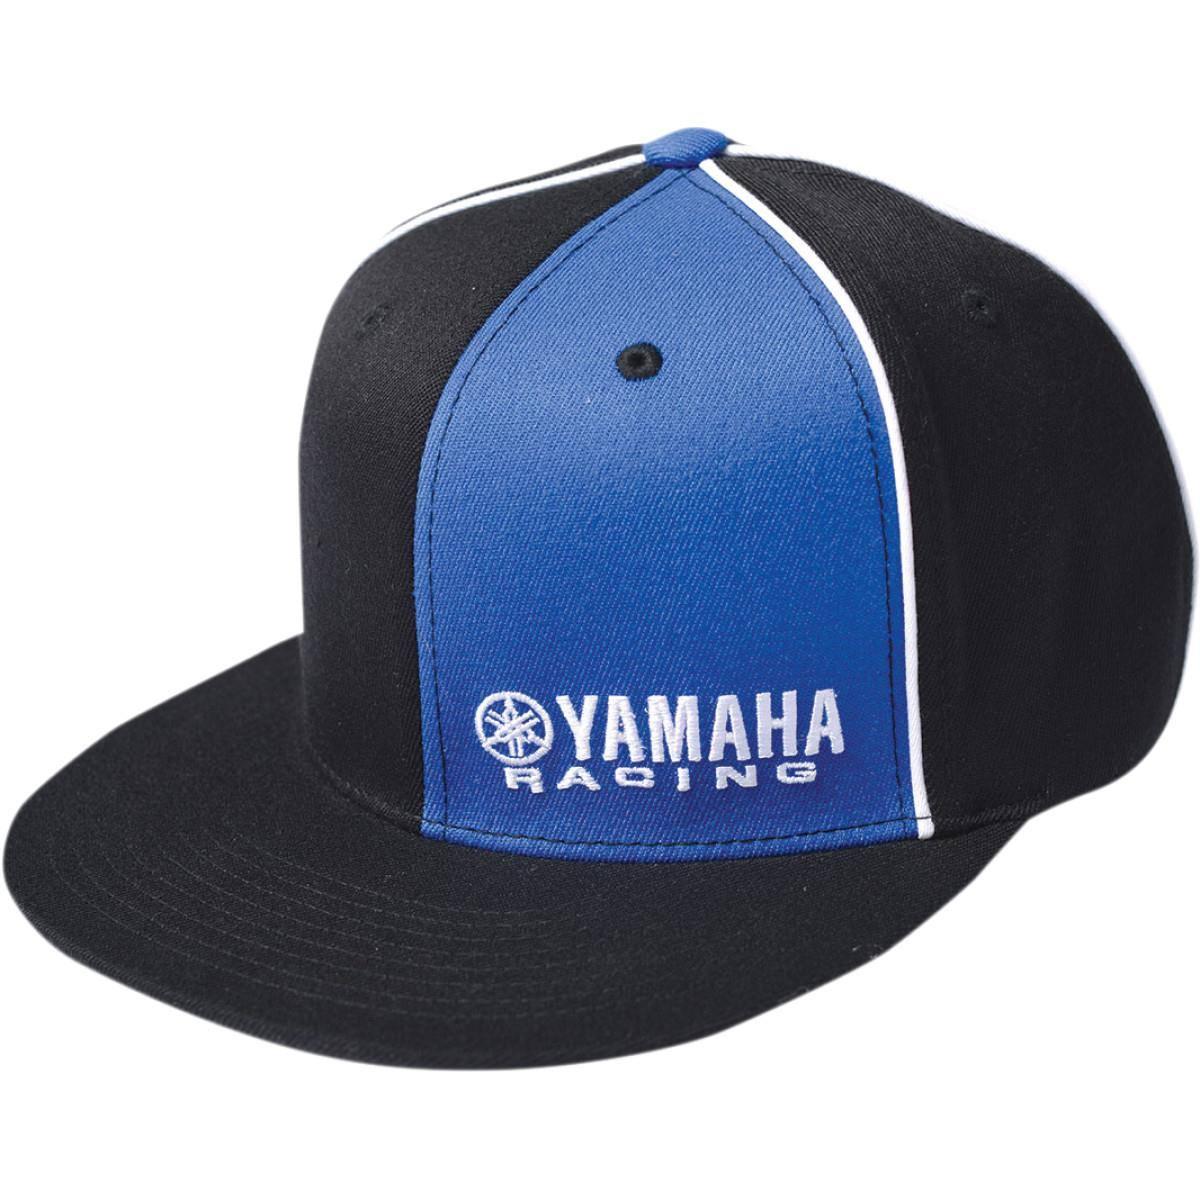 Yamaha Flexfit Hat